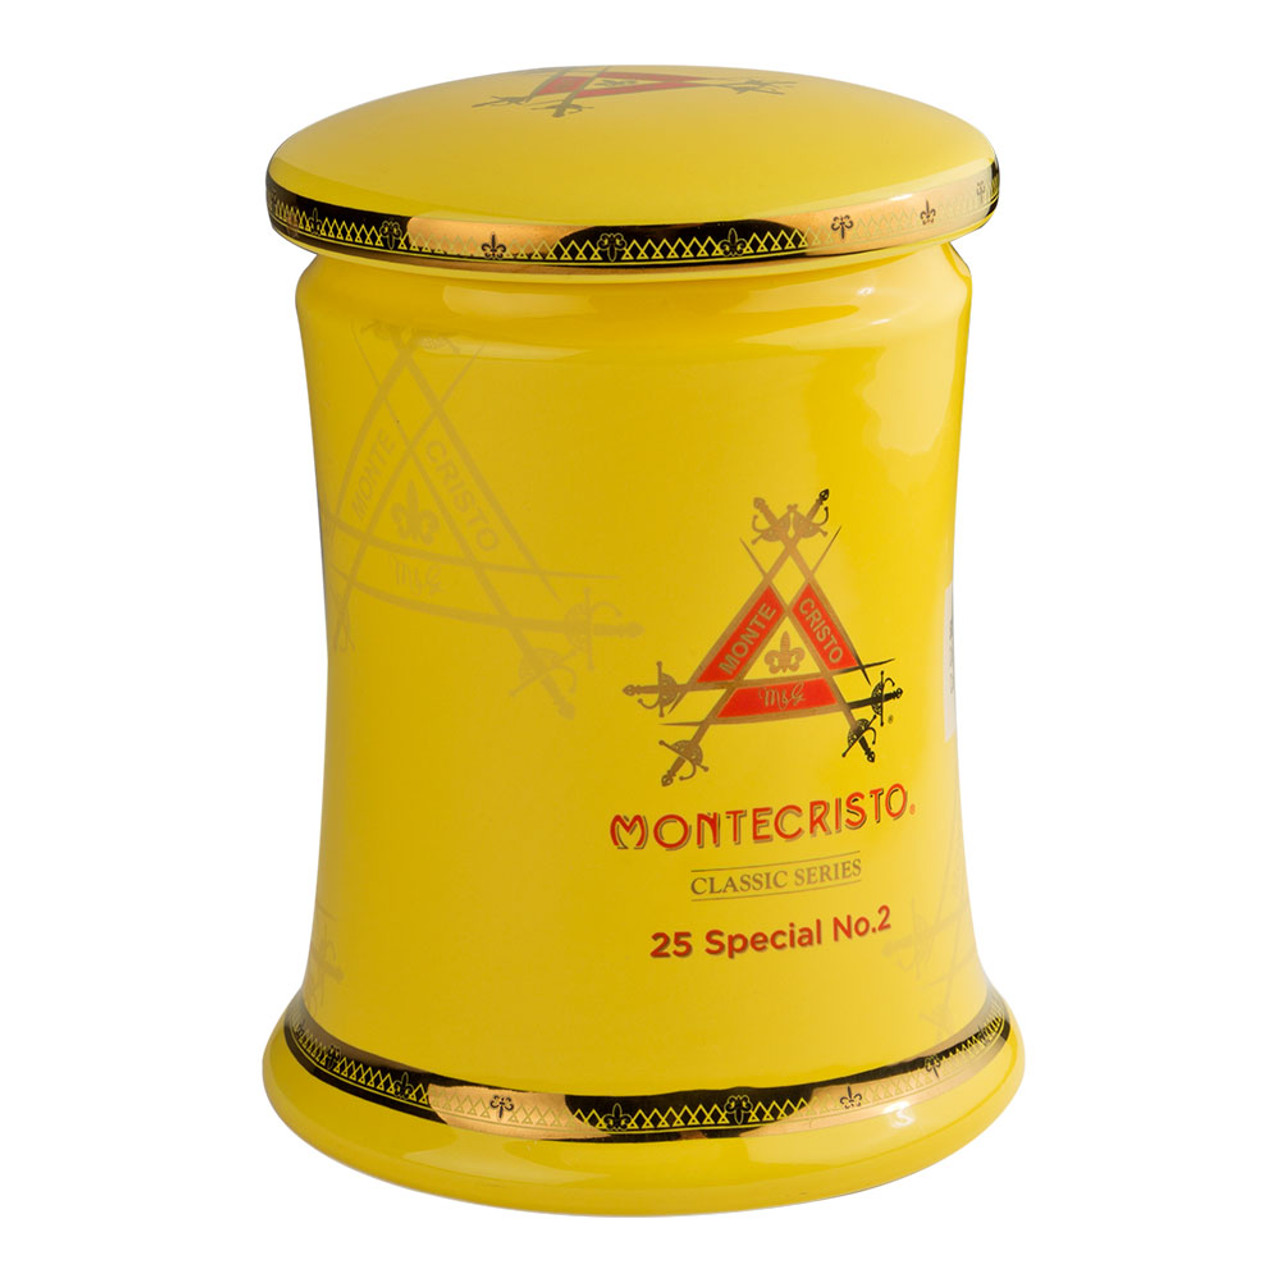 Montecristo Classic No. 2 Cigars - 6 x 50 (Jar of 25)